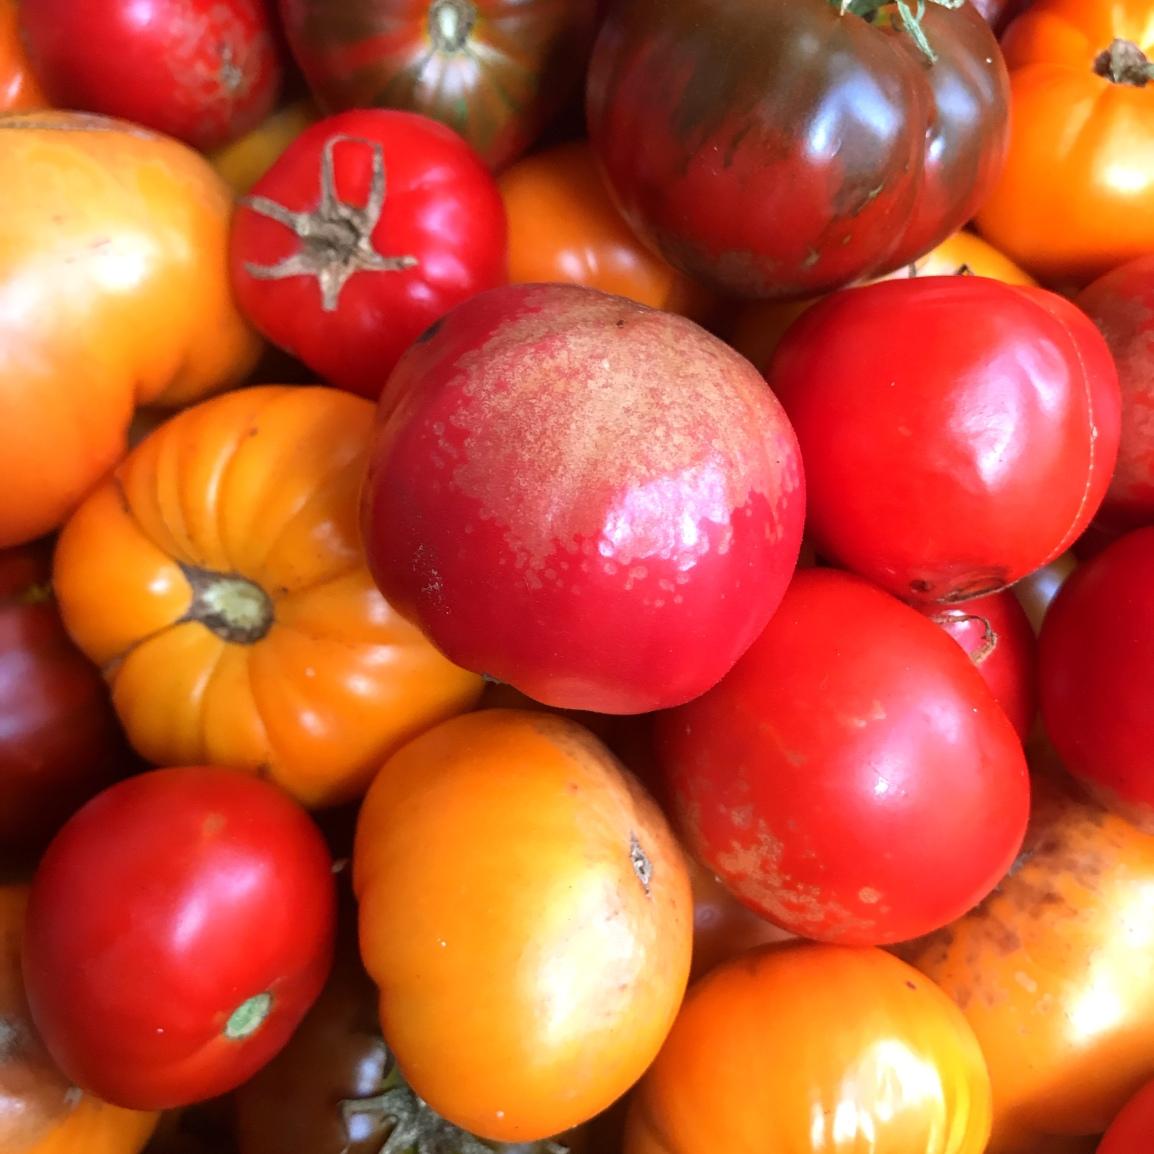 Wednesday ARTfarm Produce Pickups 3/3/2021: Uglytomatoes